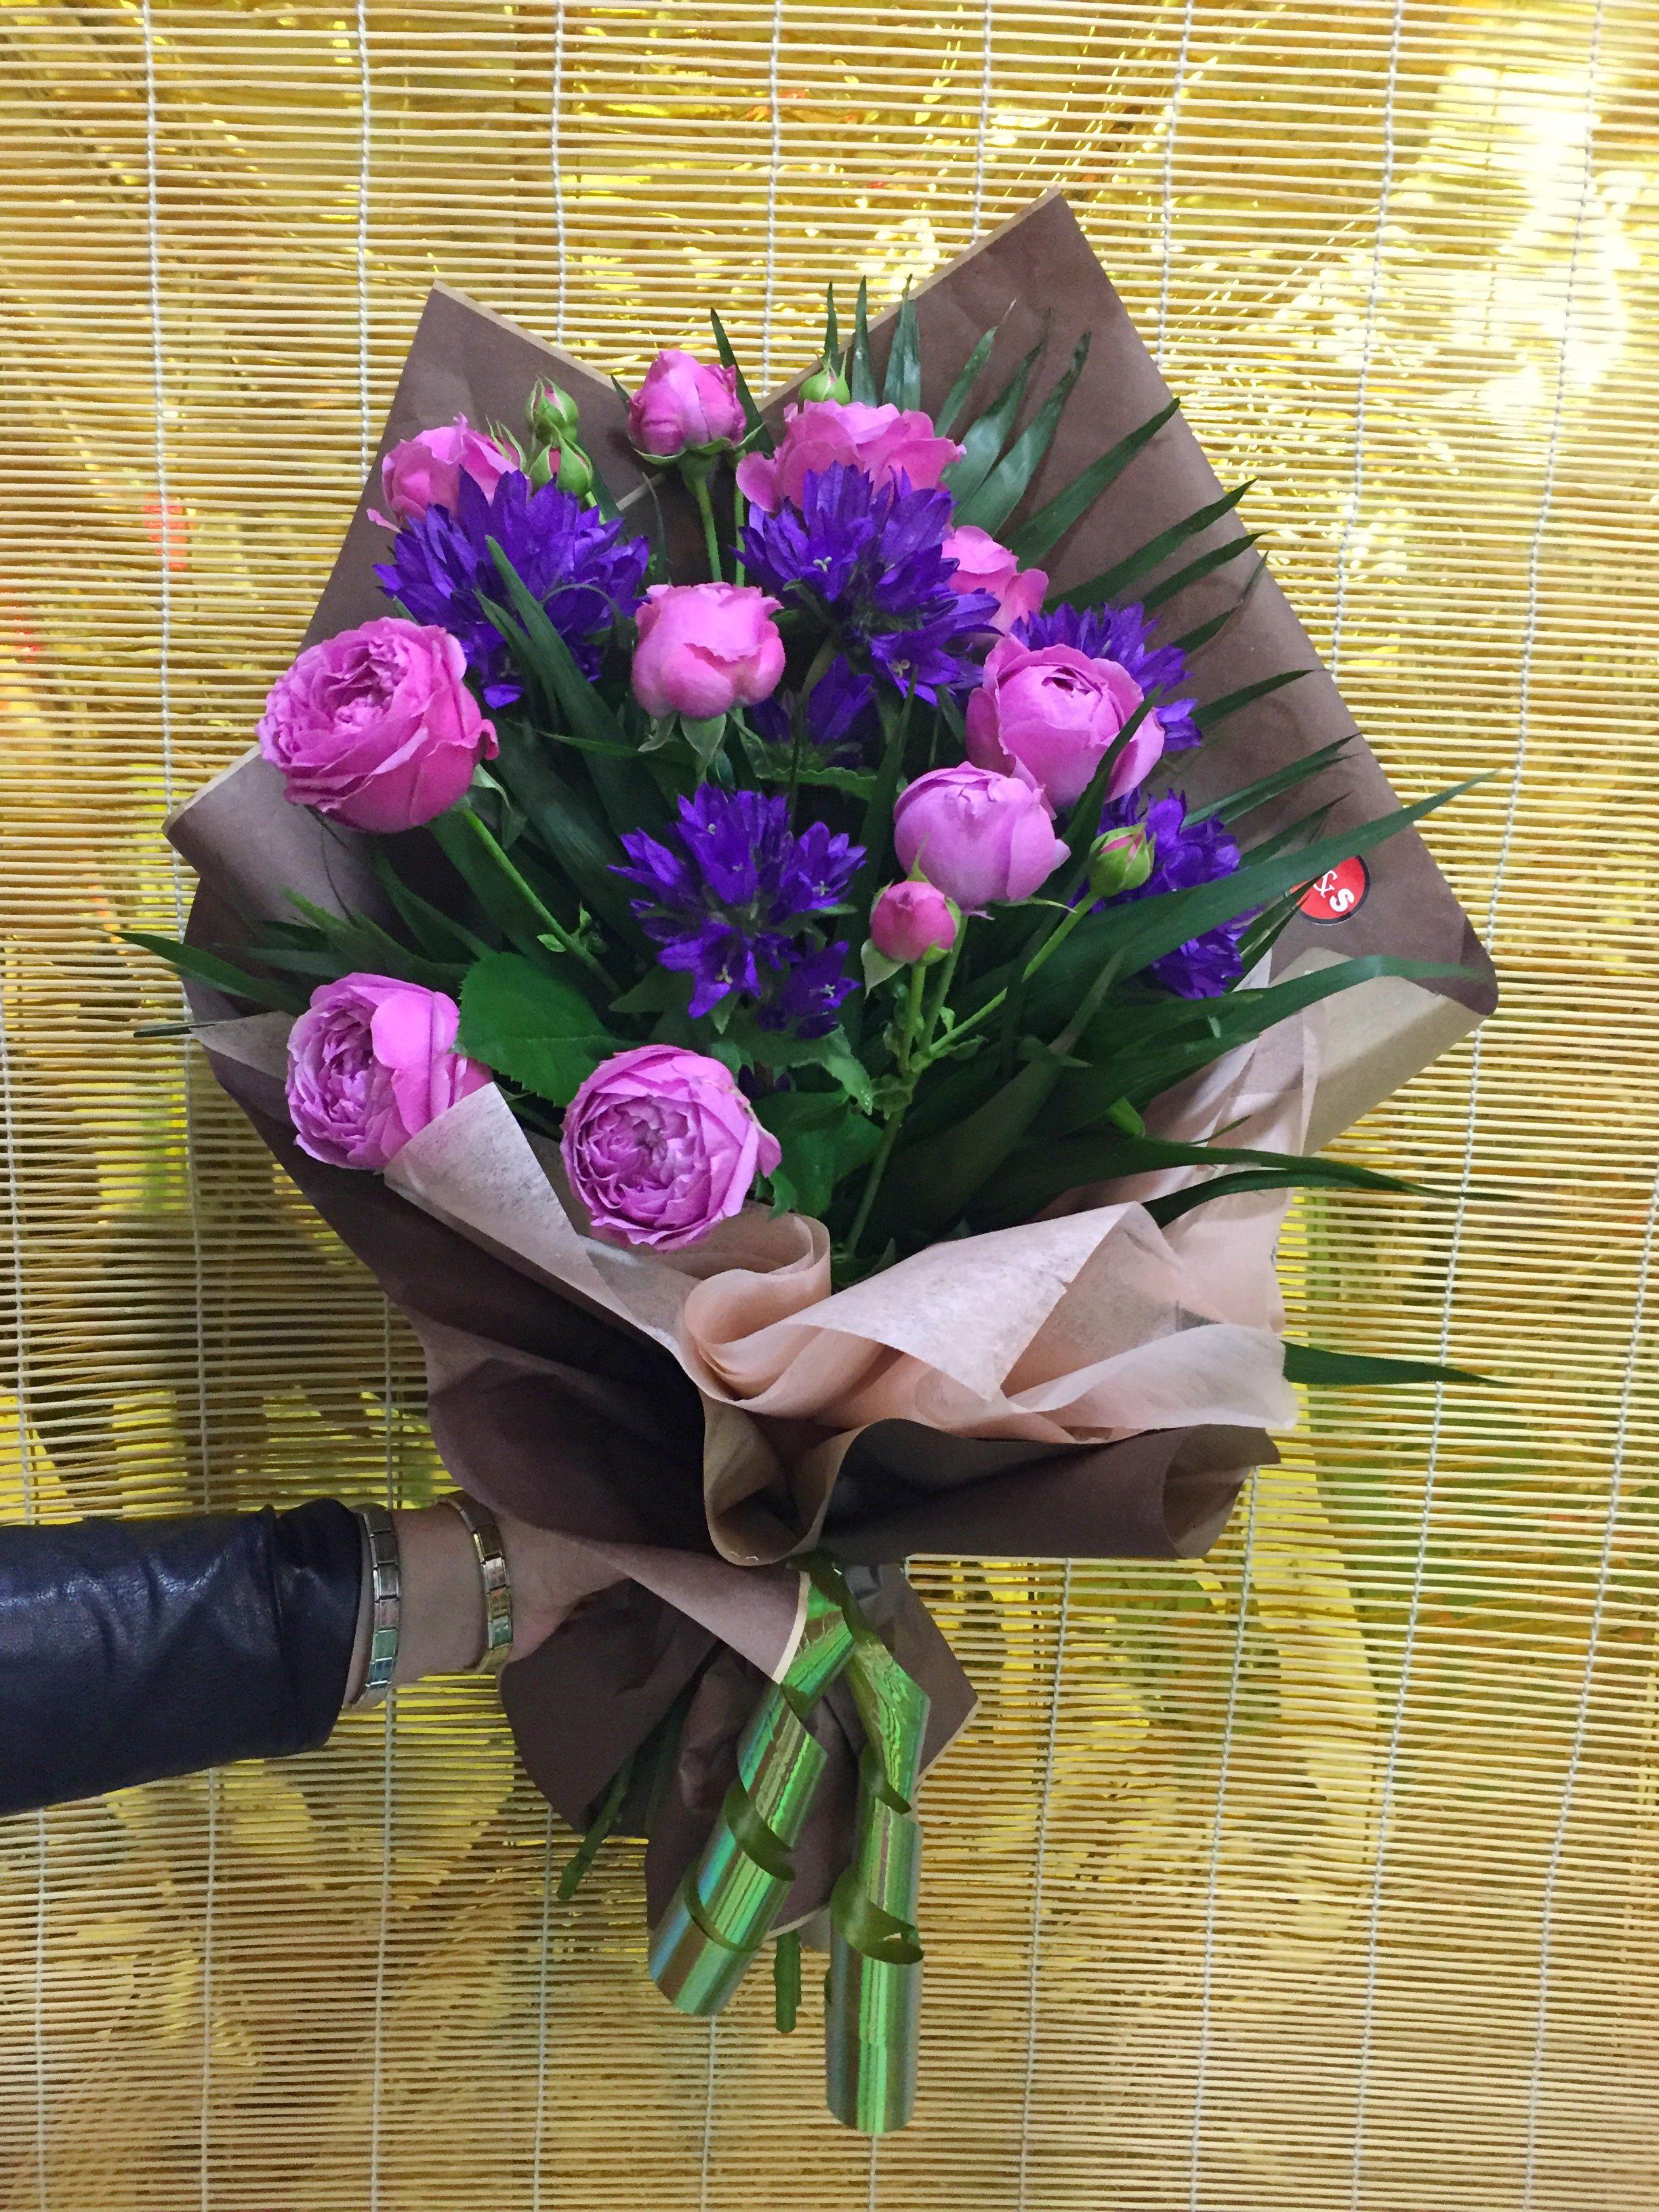 #svetlana113#insta#flowers